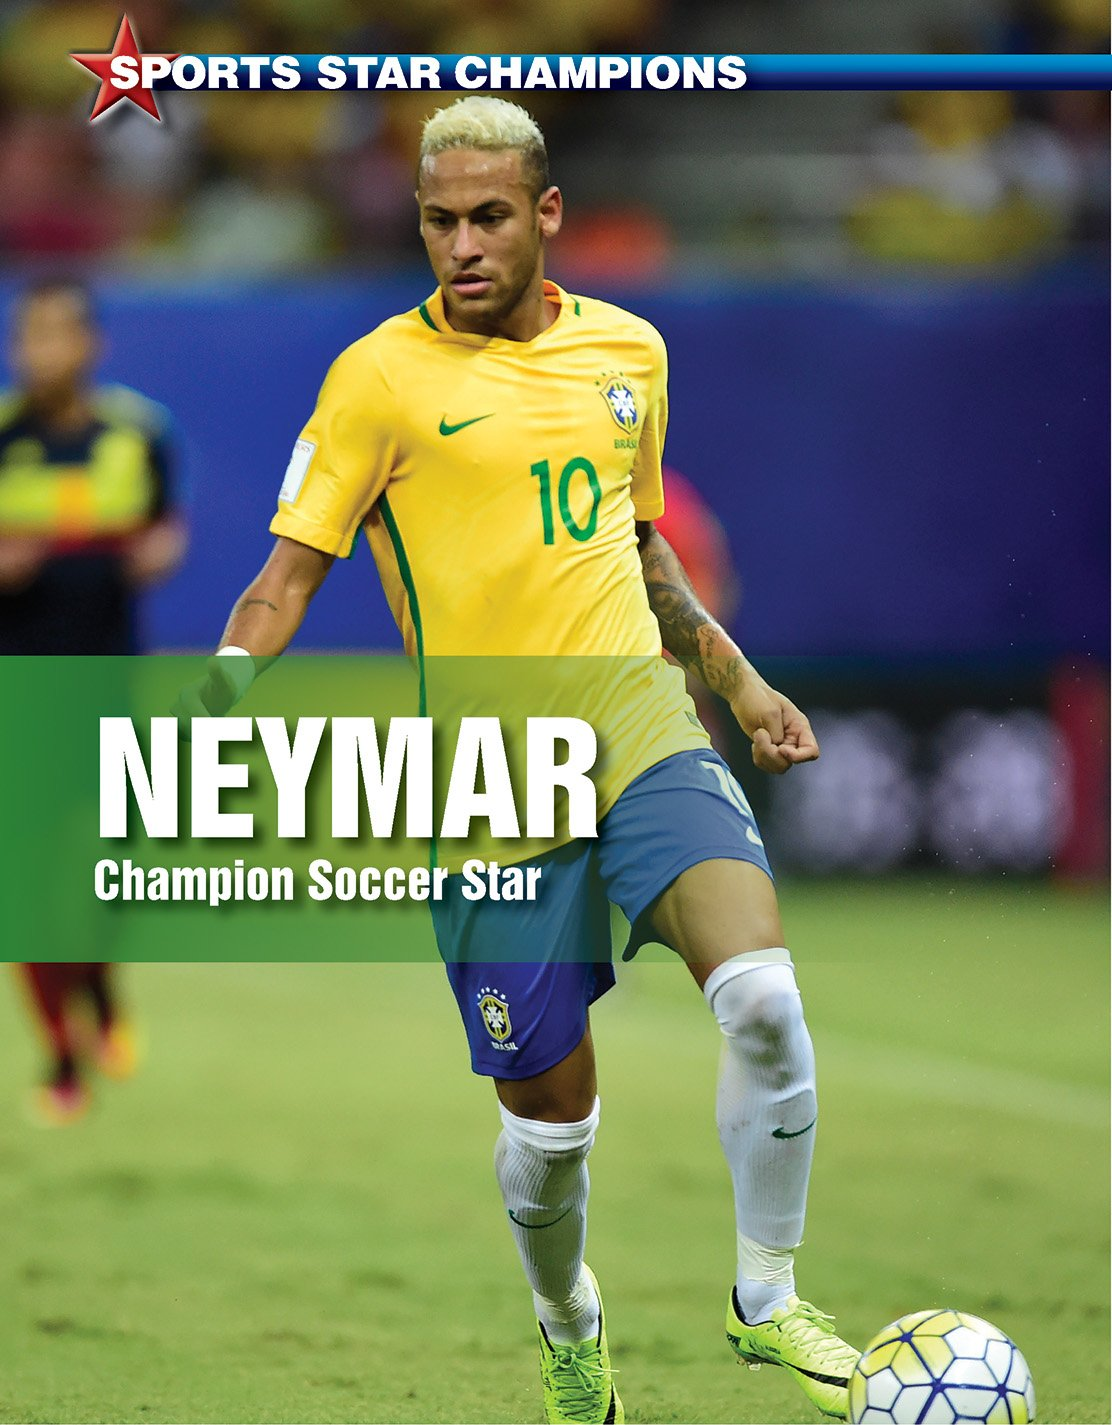 Neymar: Champion Soccer Star (Sports Star Champions) by Enslow Pub Inc (Image #1)